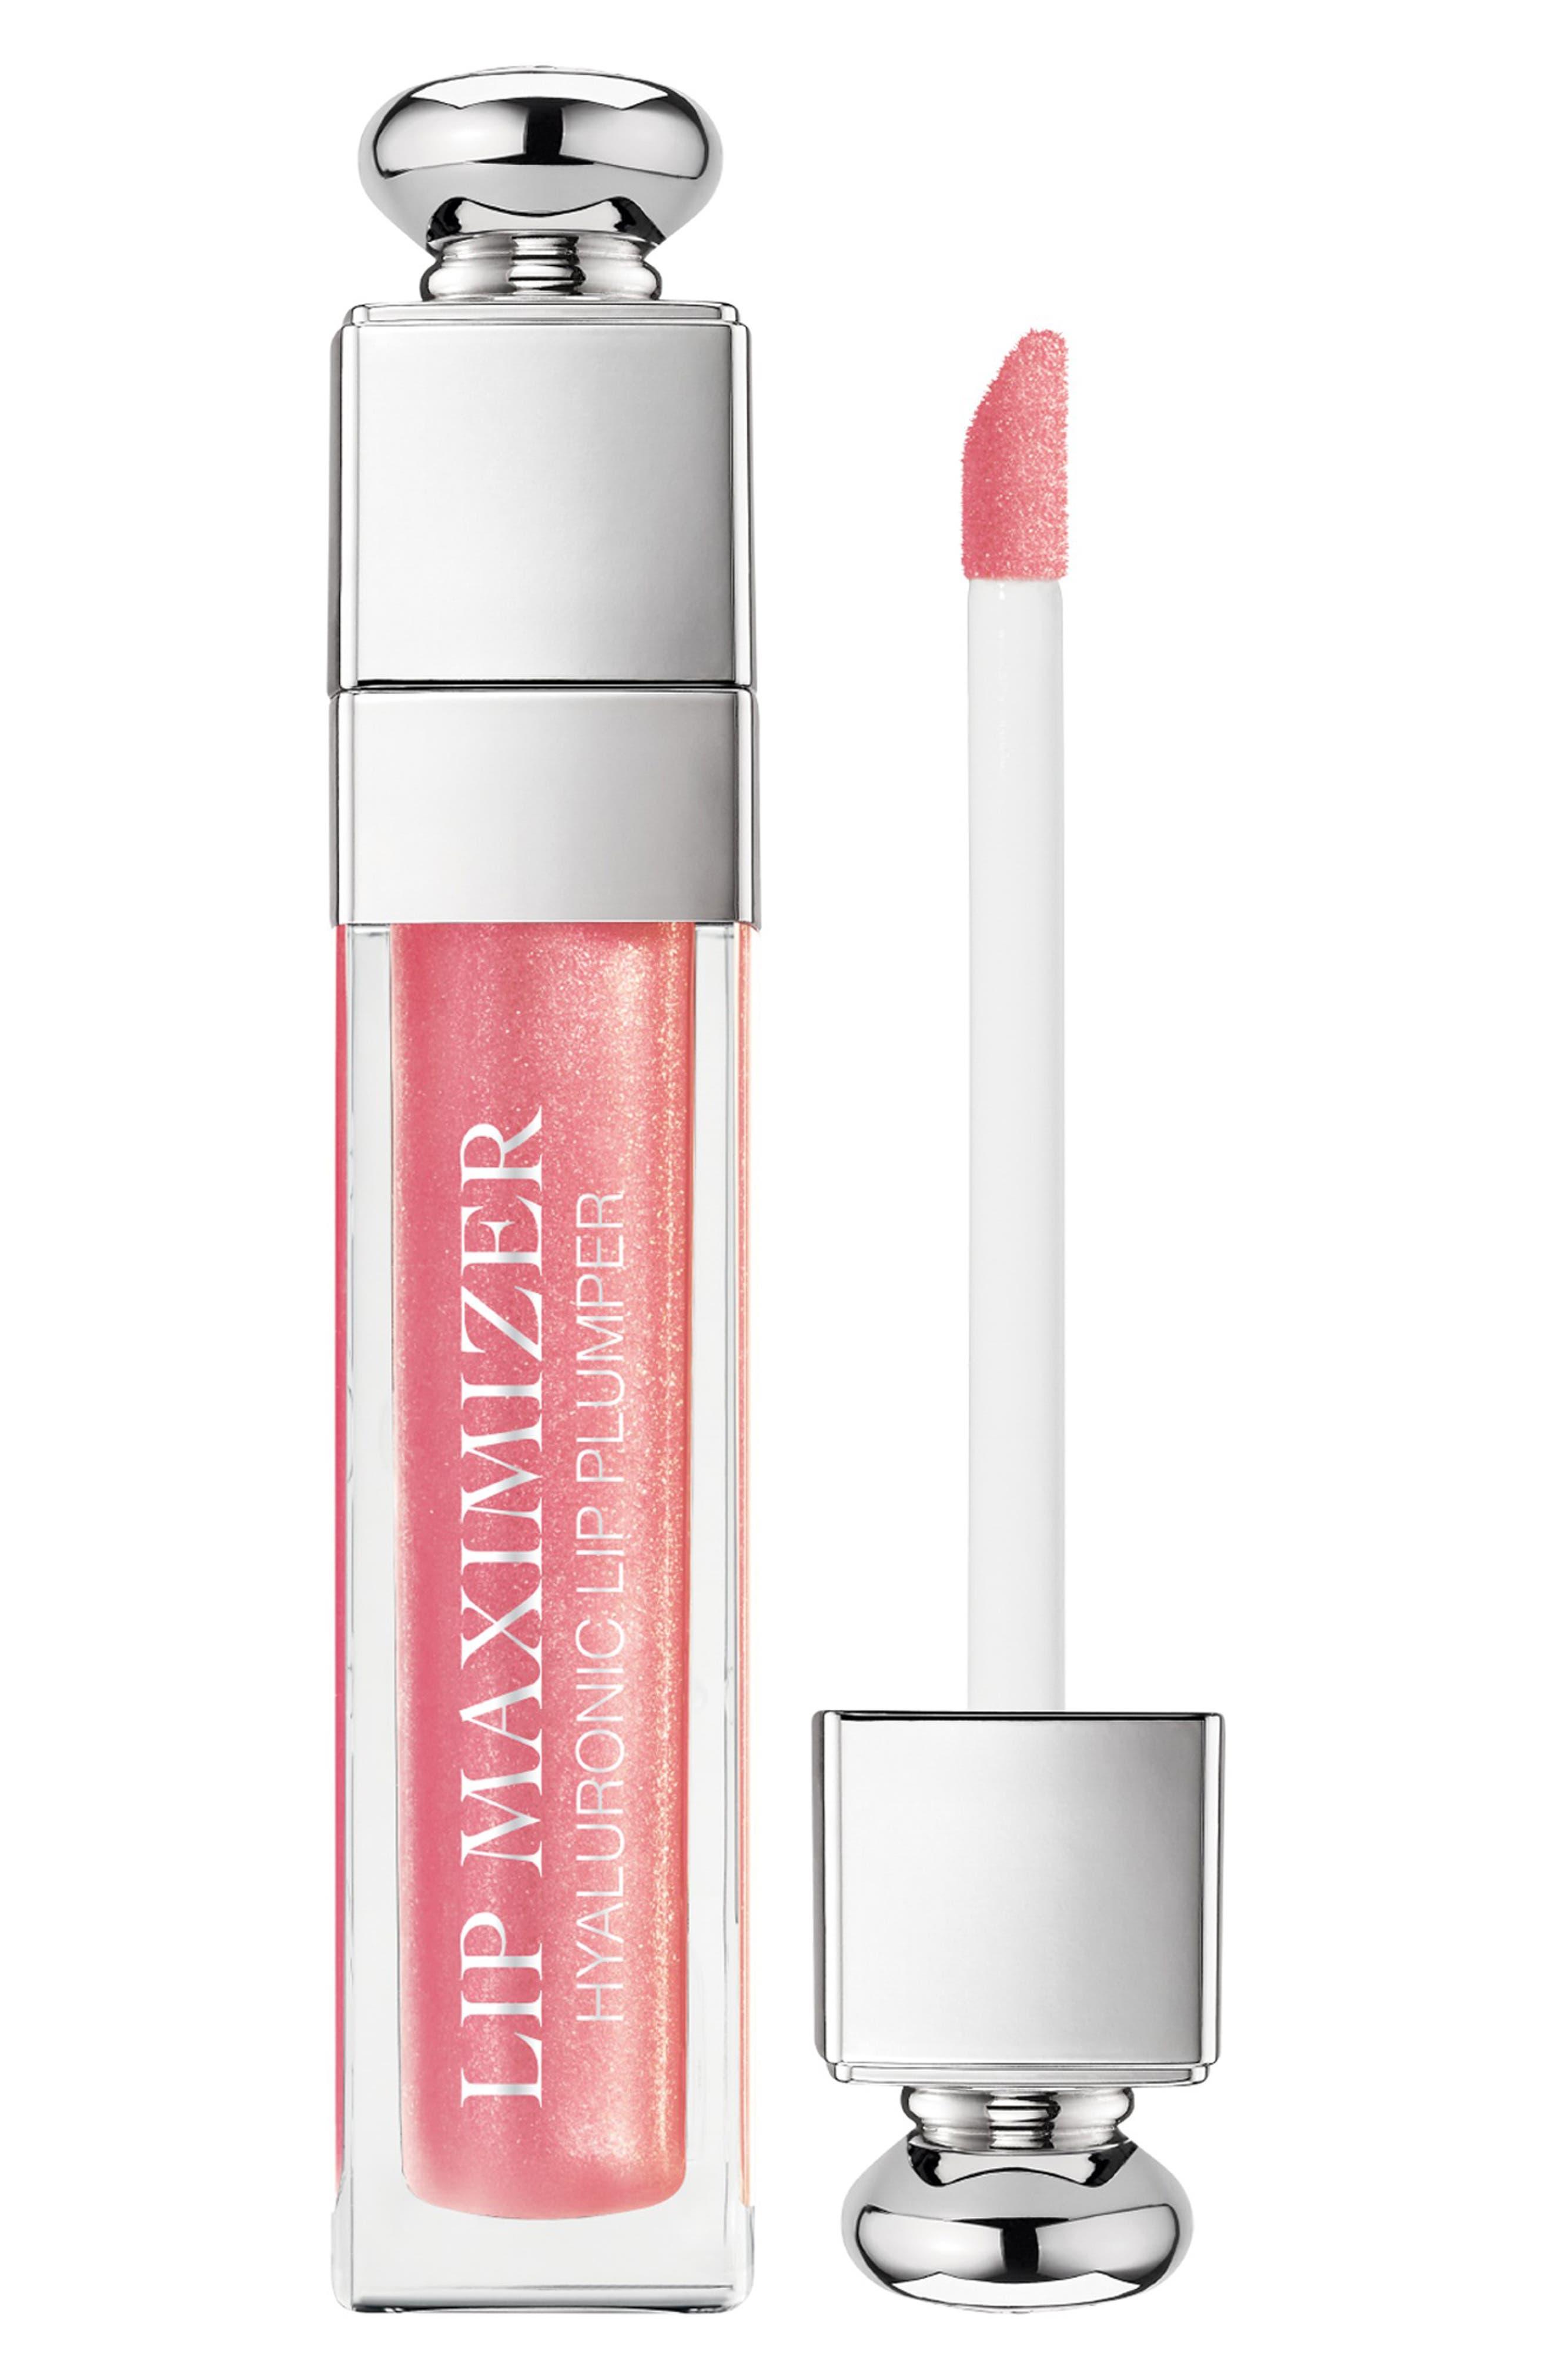 Dior Addict Lip Maximizer - 010 Pink/ Holographic